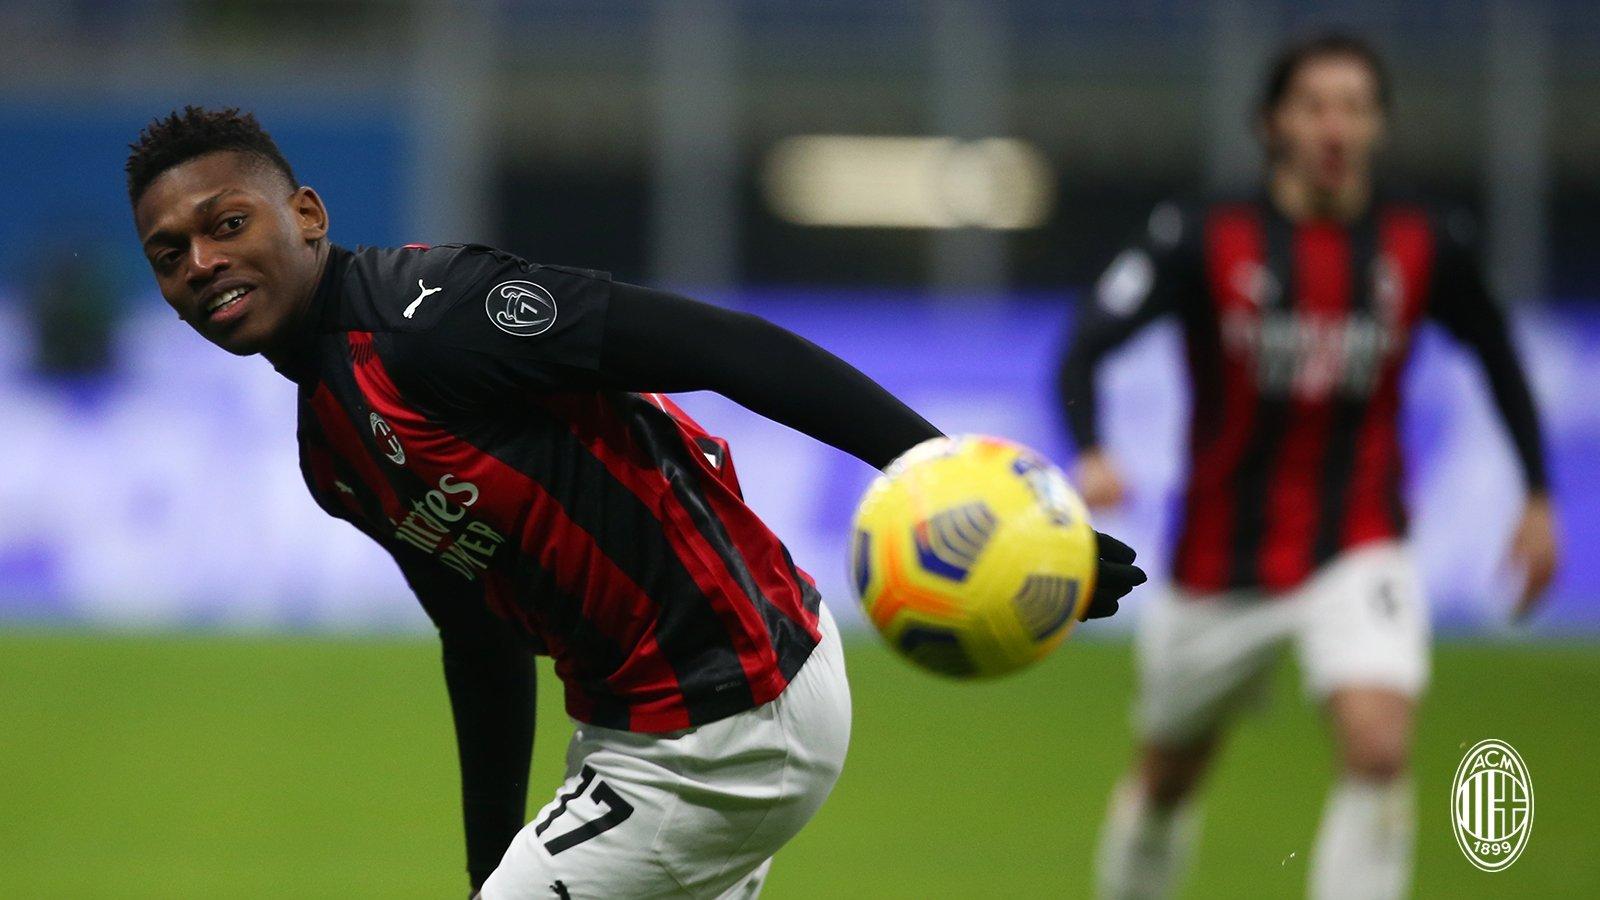 Jadwal Liga Italia Akhir Pekan Ini: AC Milan vs Atalanta